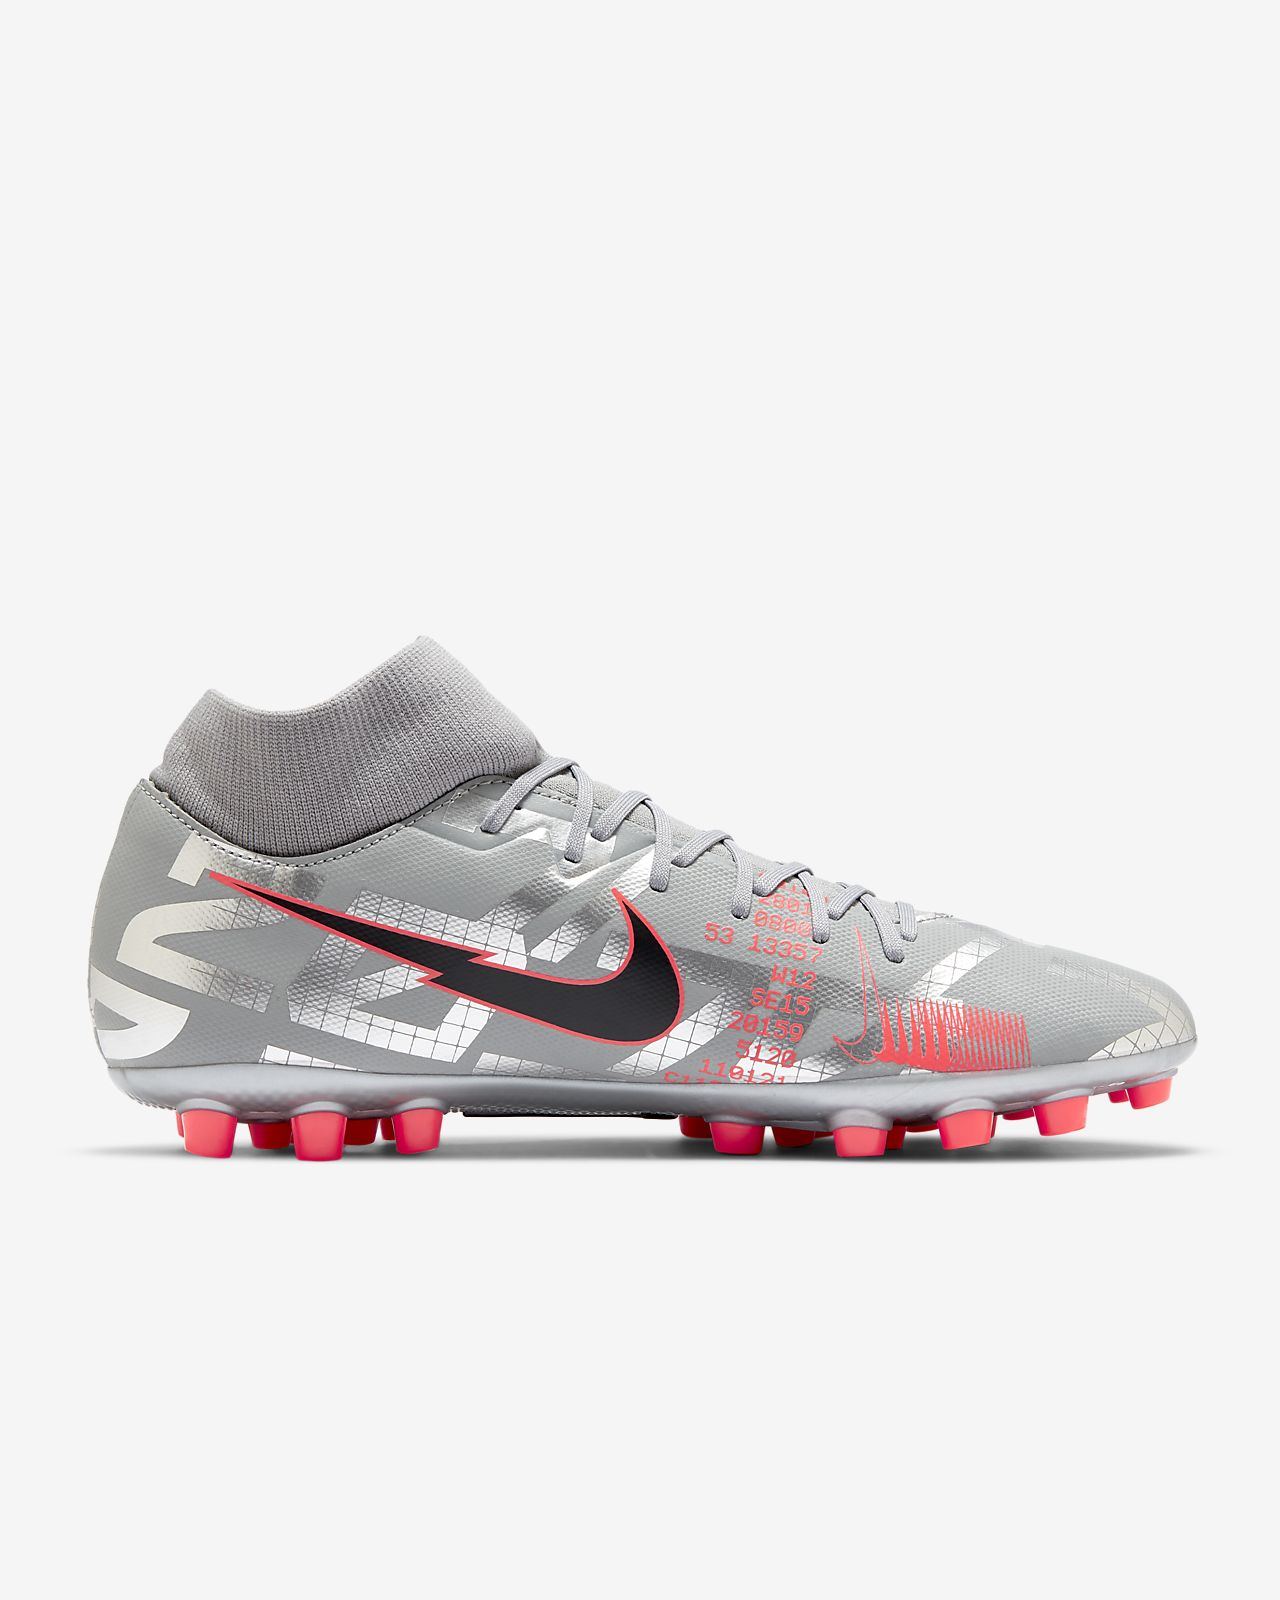 Scarpa da calcio per erba artificiale Nike Mercurial